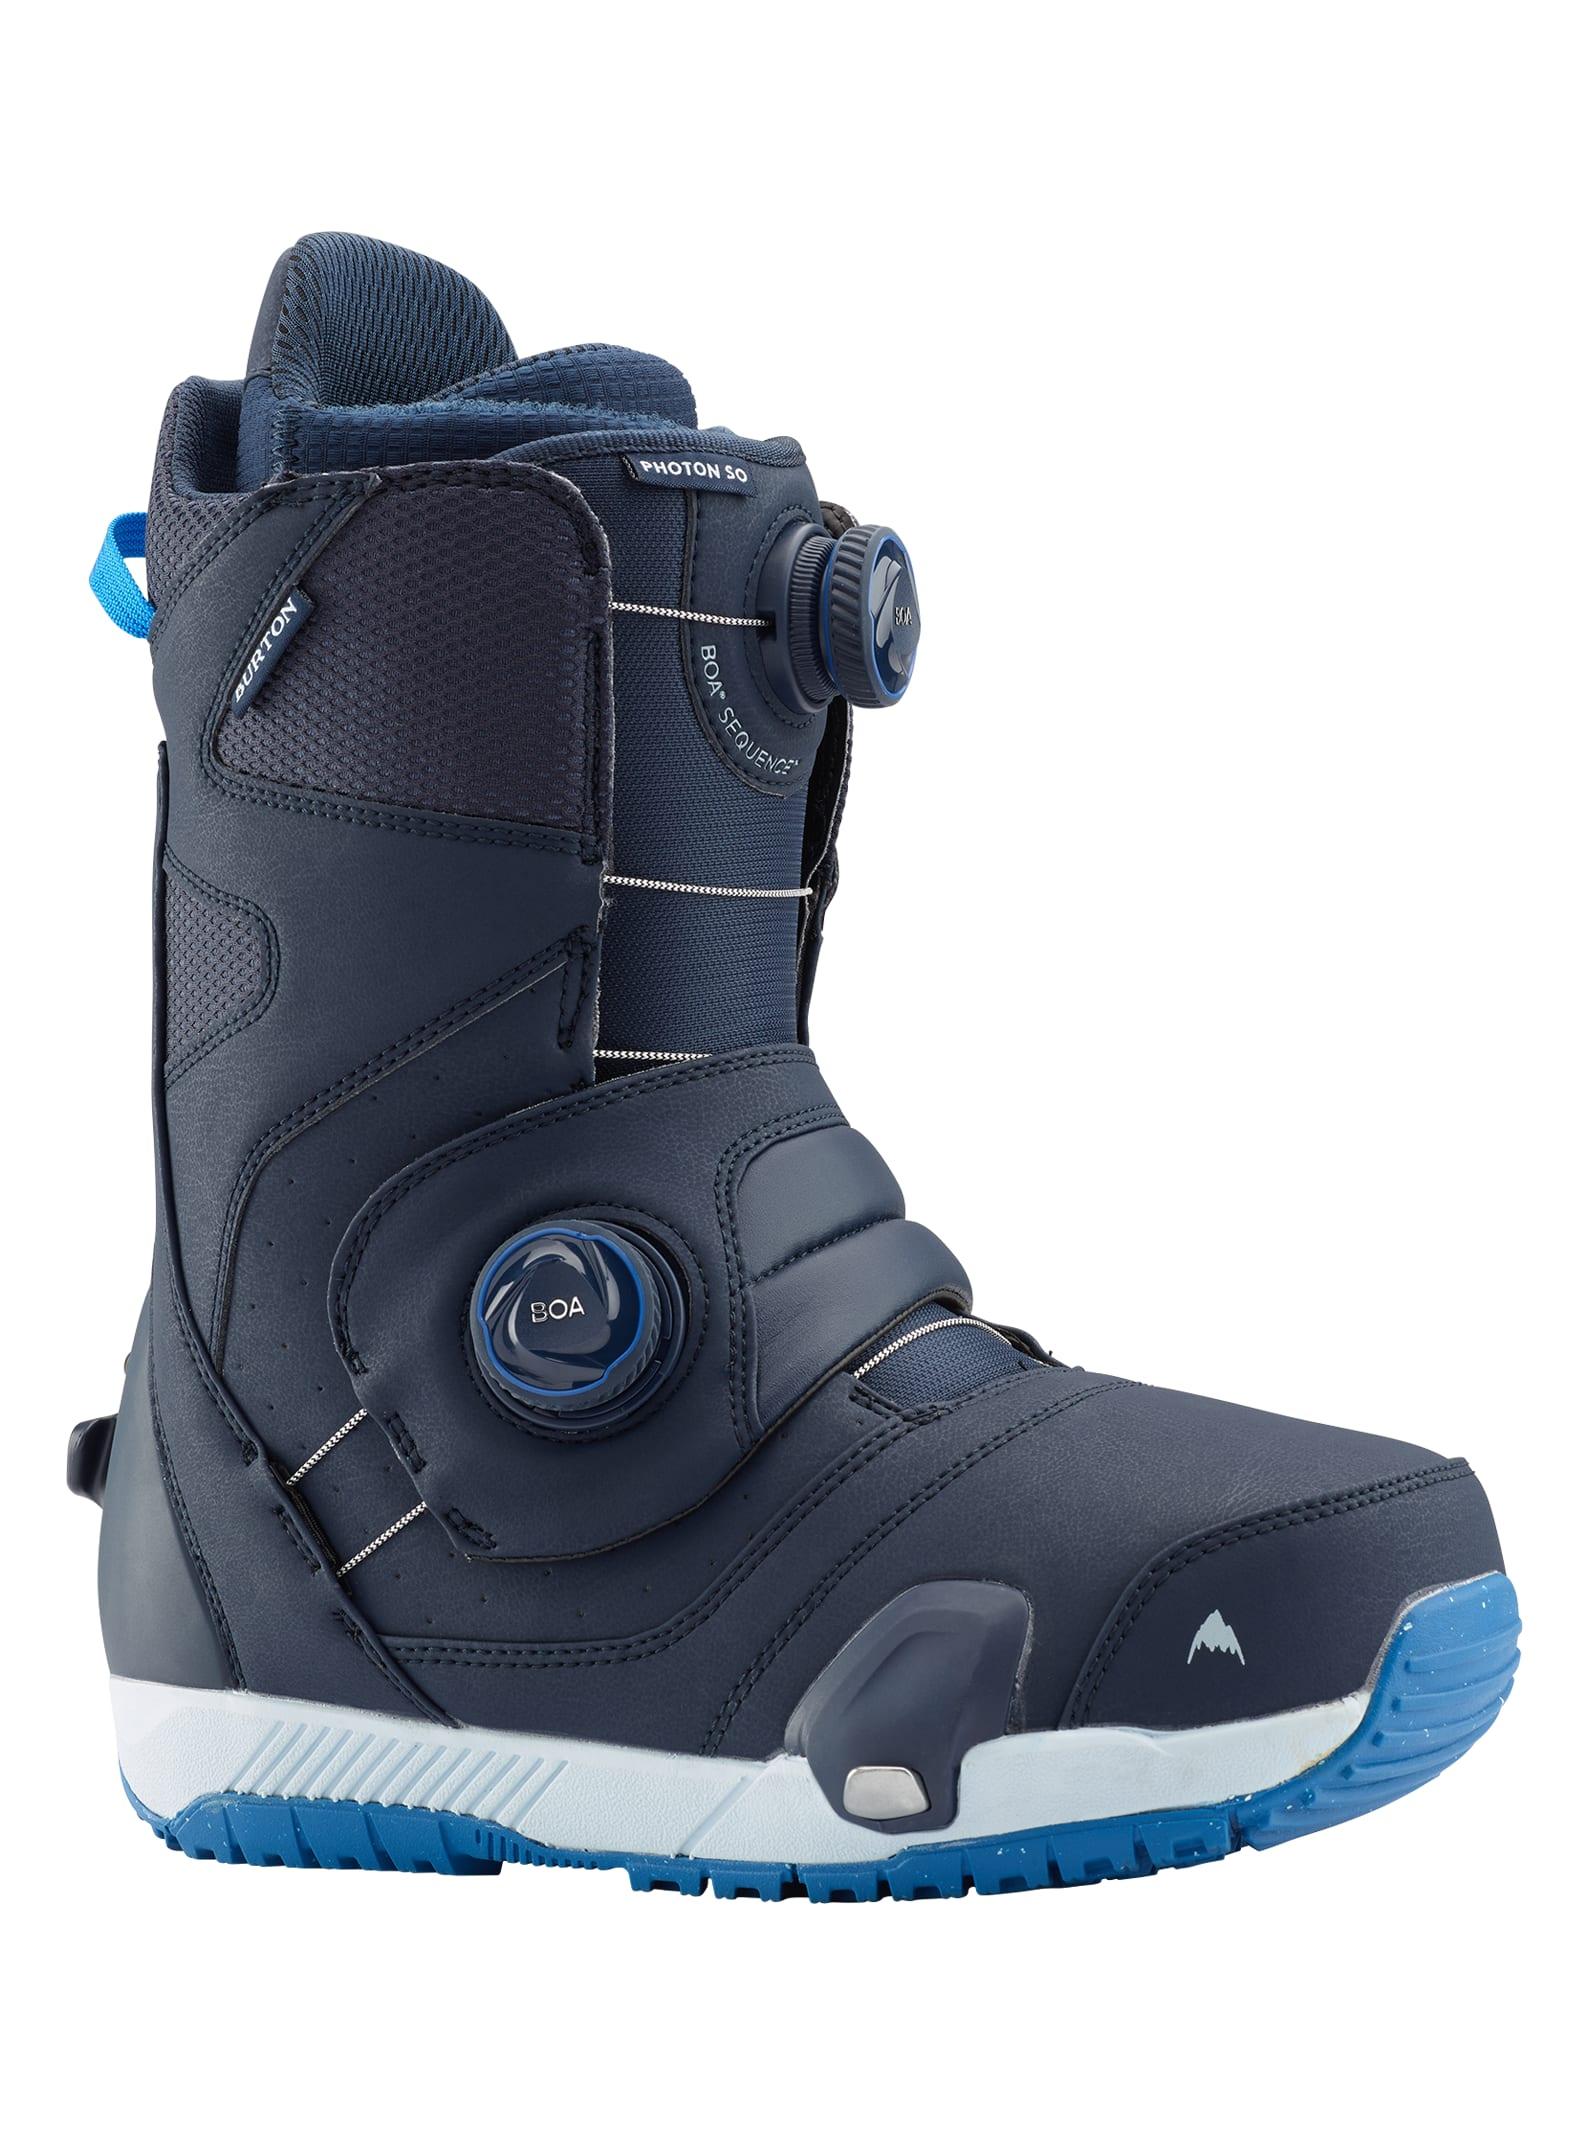 ostaa paras paras halpa hieno muotoilu Men's Burton Photon Step On® Wide Snowboard Boot